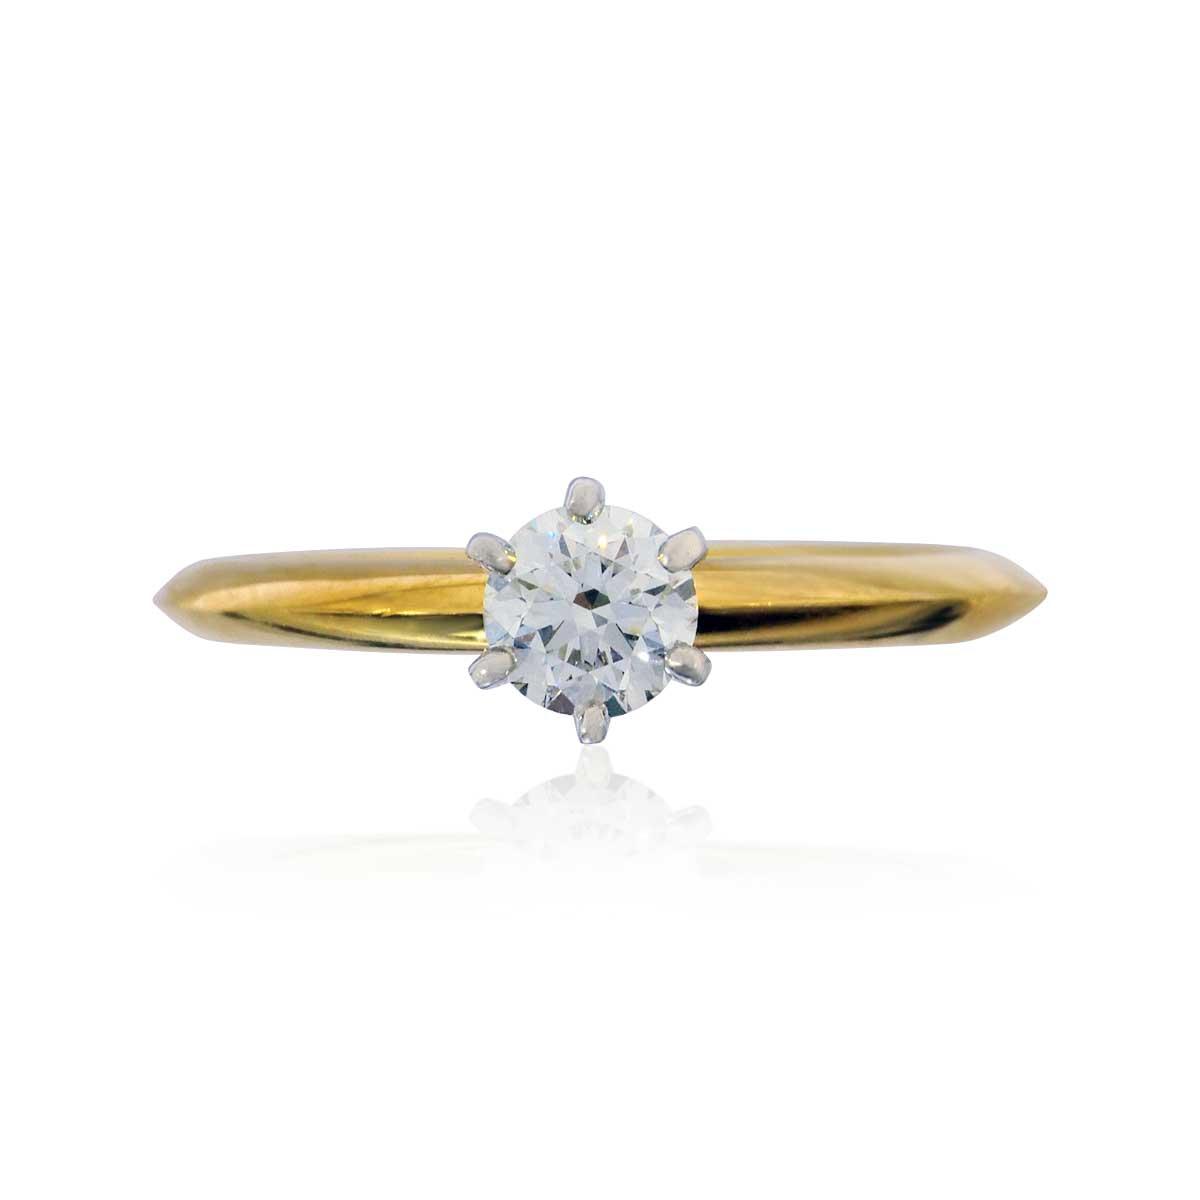 Tiffany® Solitärring 0,327ct Diamant in 750 Weissgold-Gelbgold ...